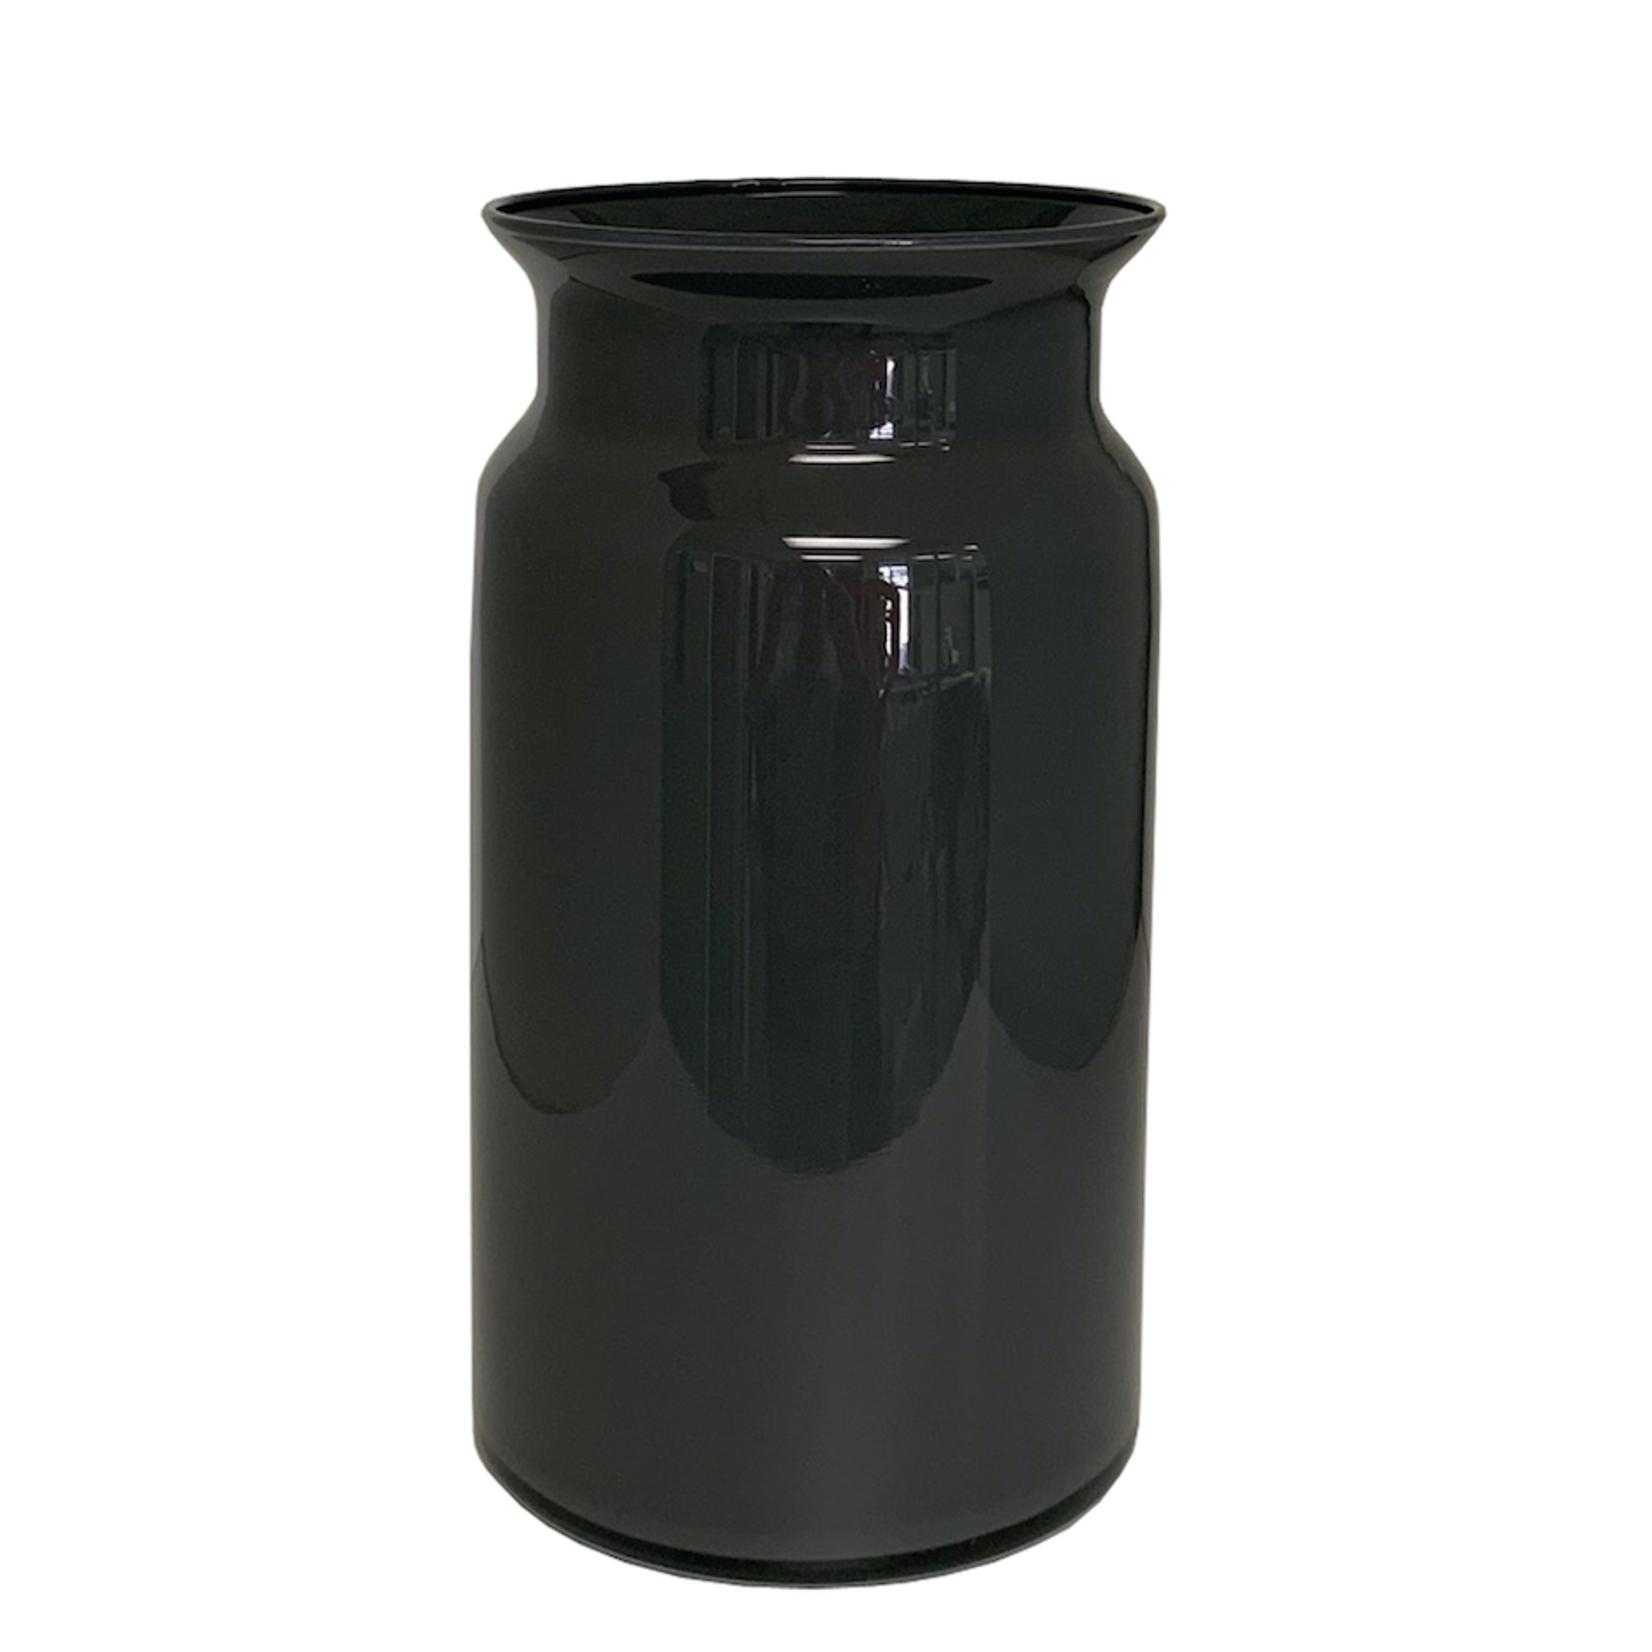 "CANPOL 11.5"" X 6.25"" DARK GREY LARGE GLASS JAR"